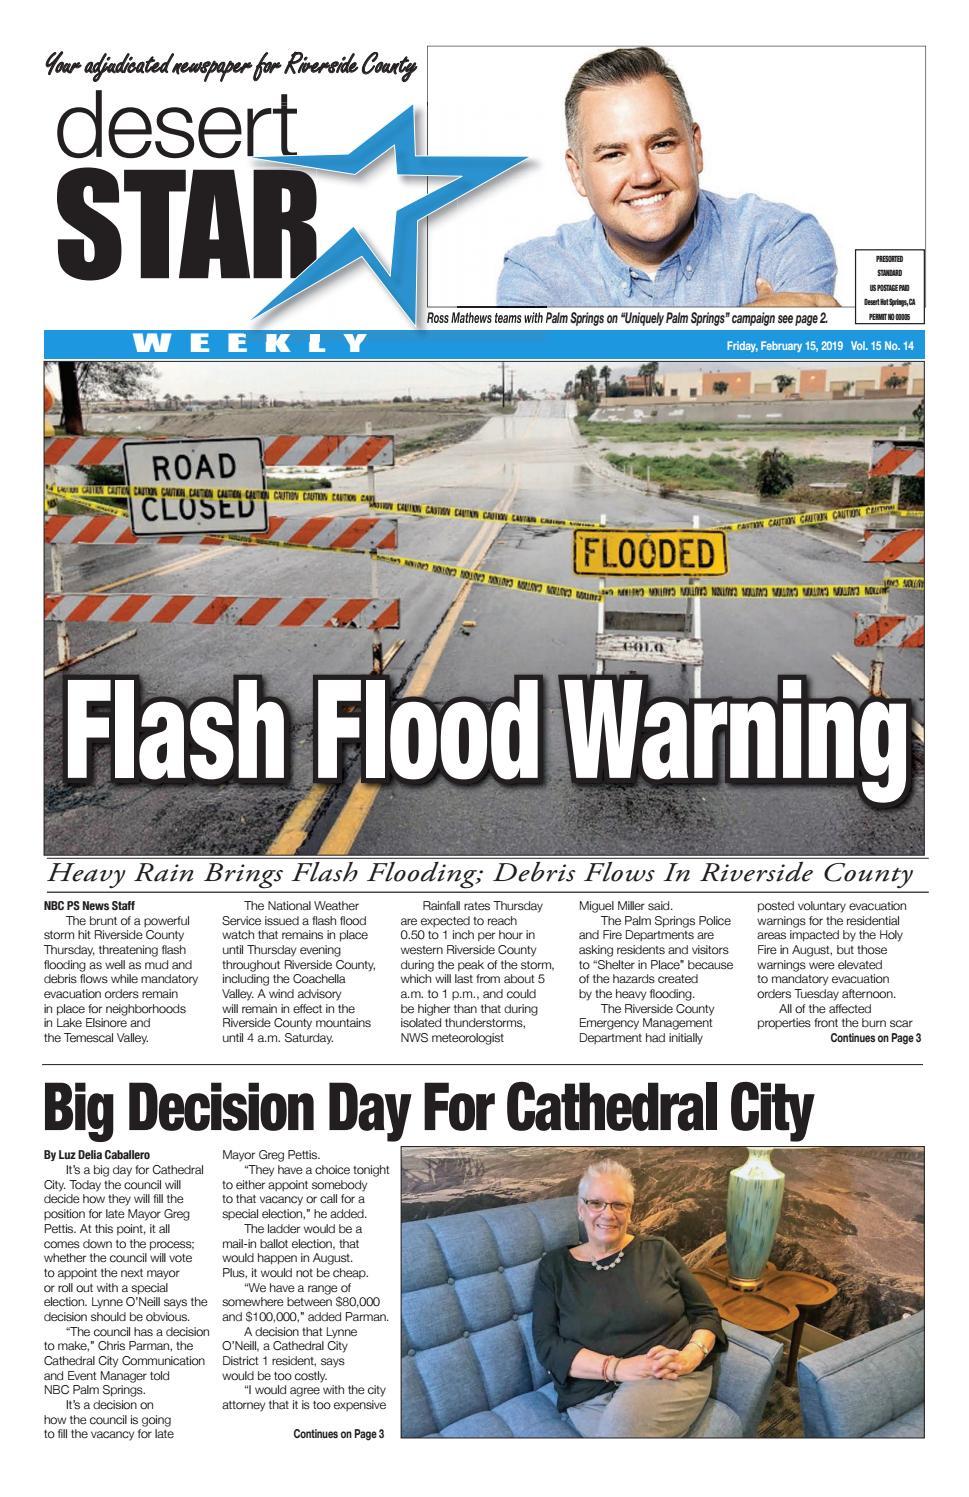 Desert Local News Feb  15, 2019 by The Desert Star Weekly